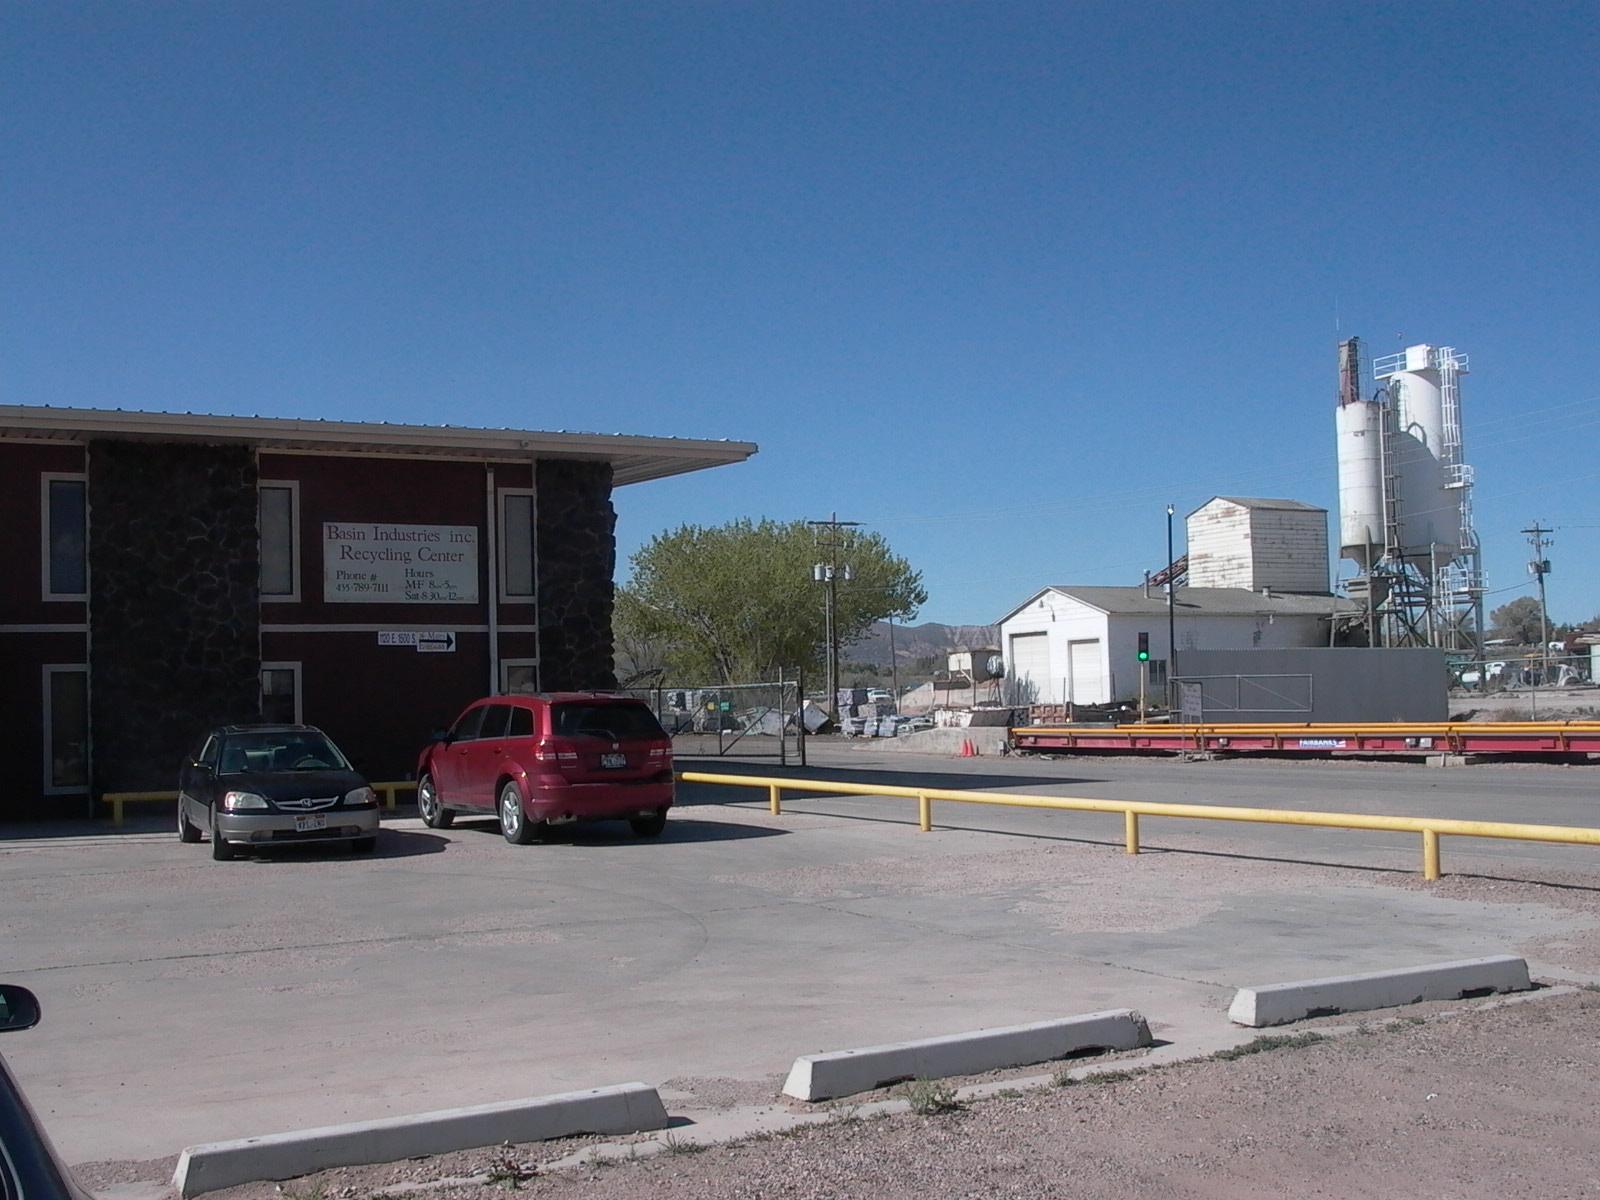 Basin Industries